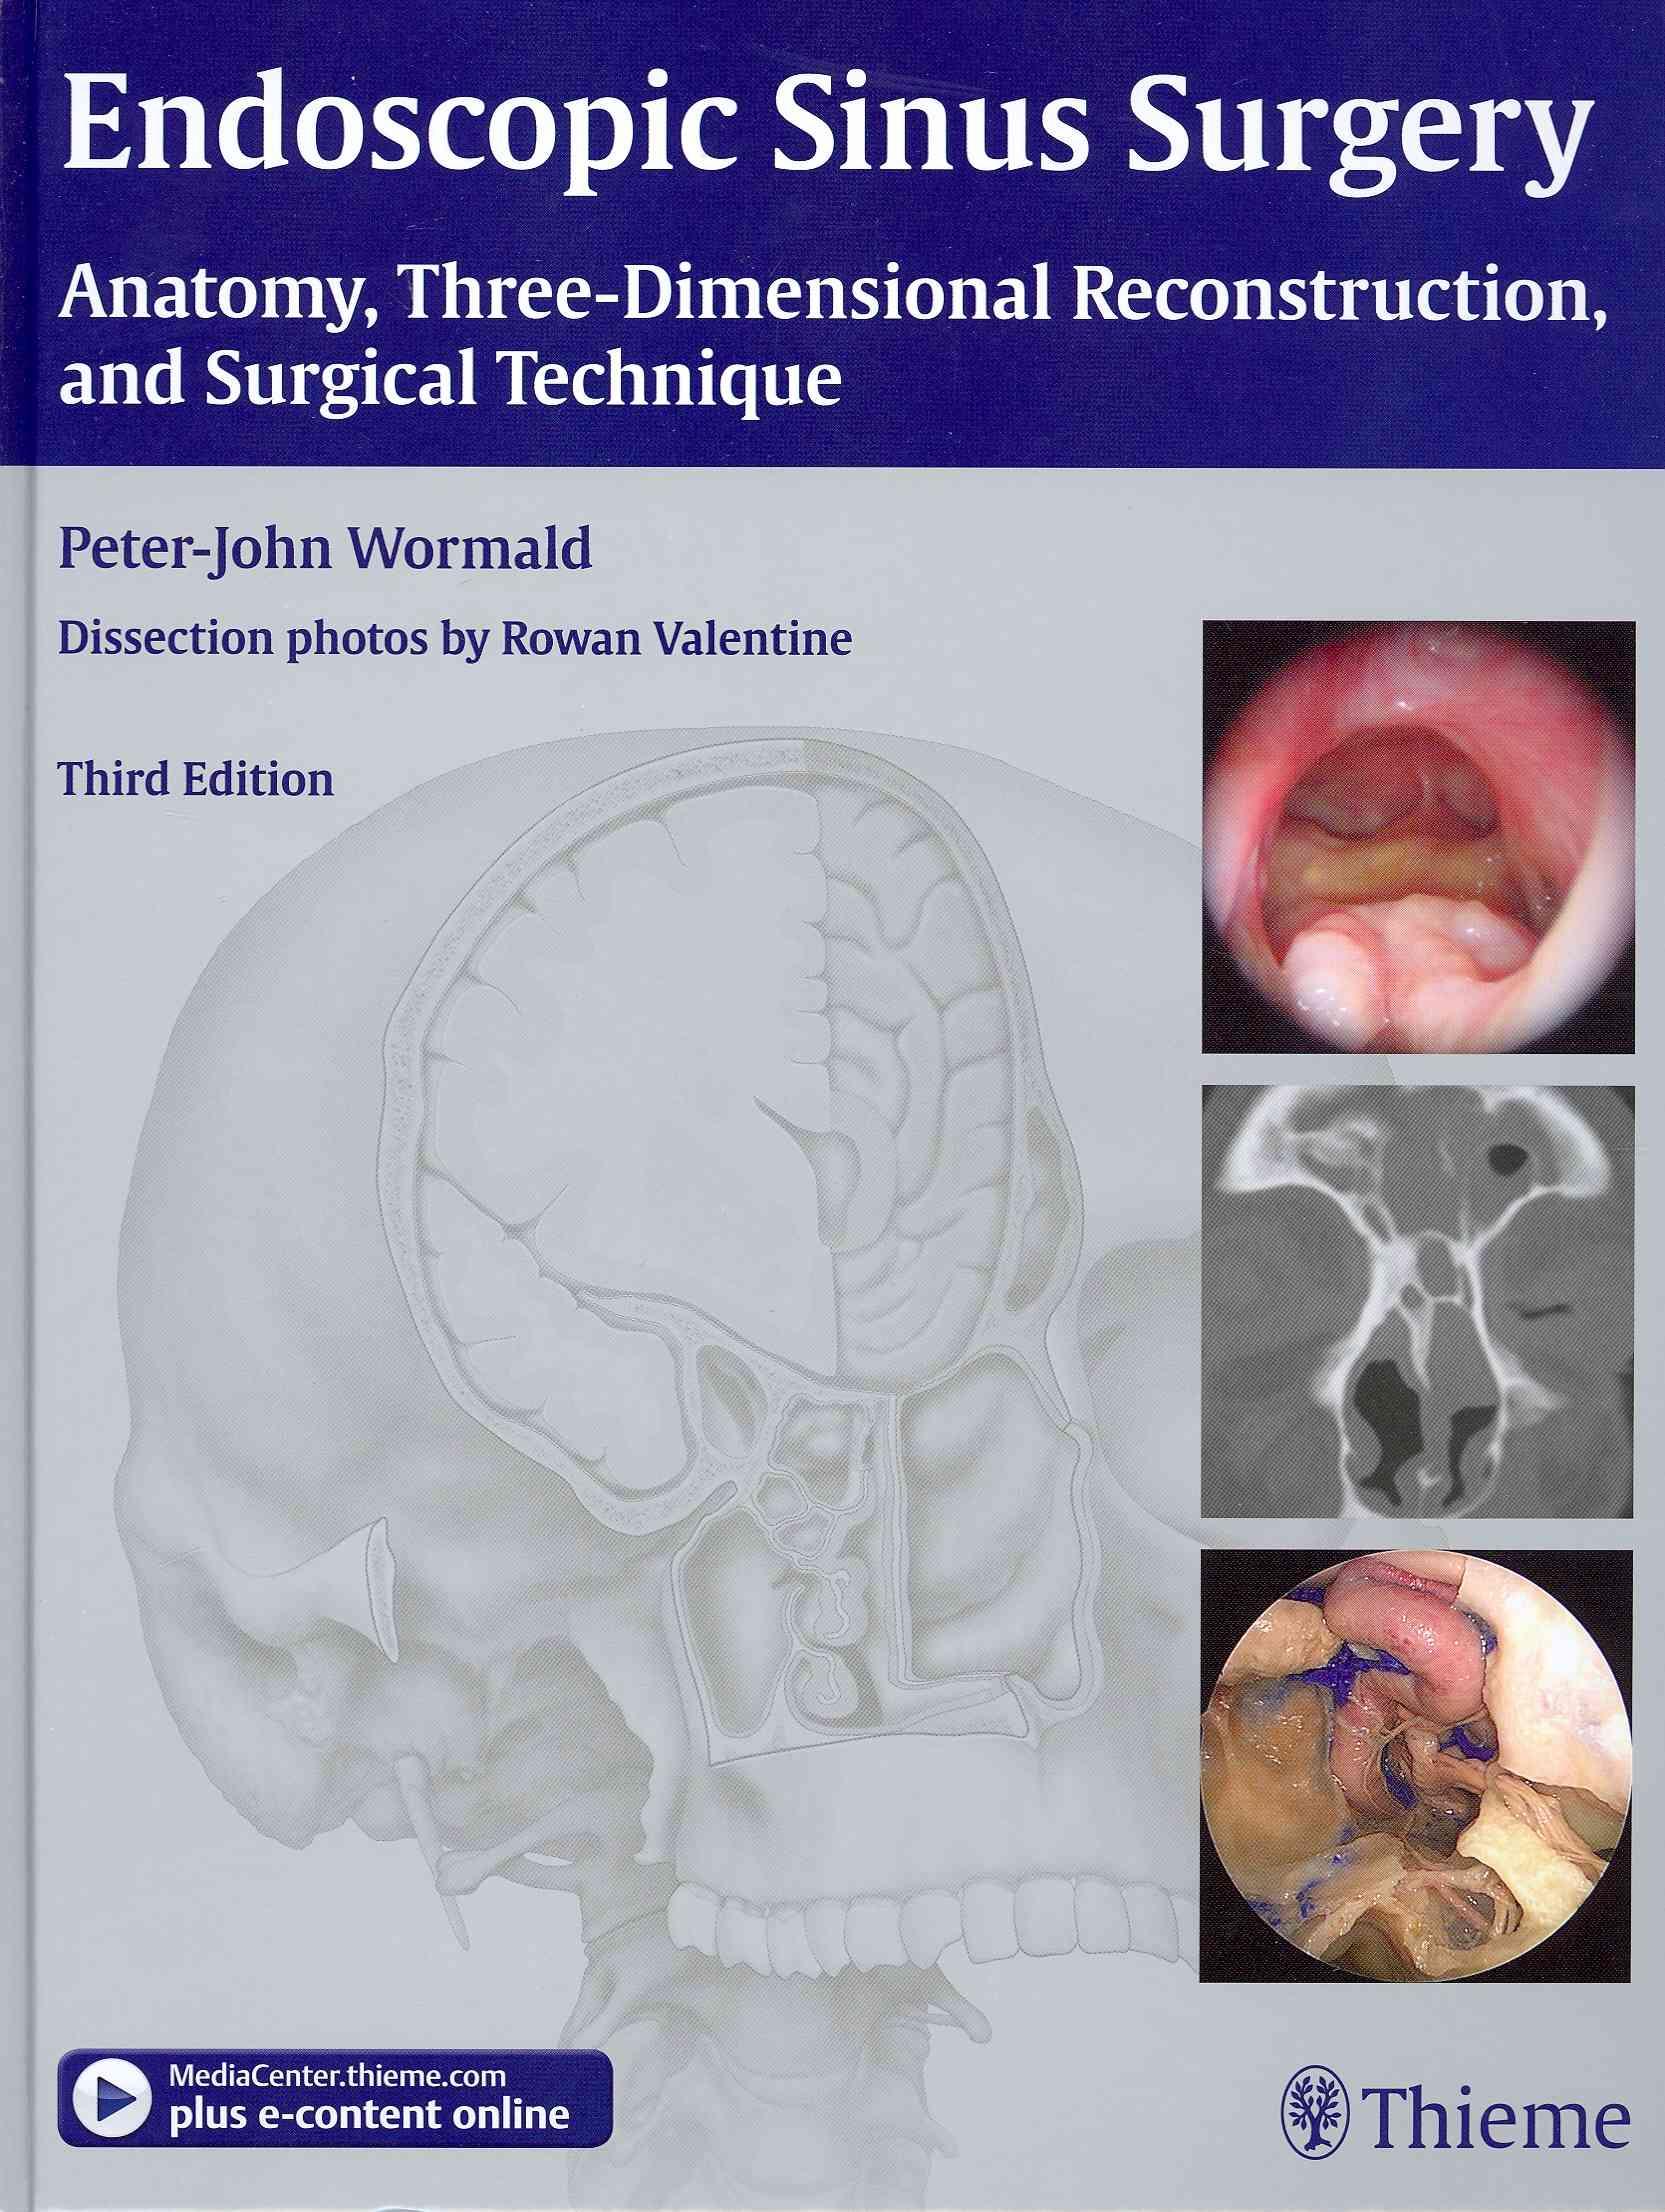 Endoscopic Sinus Surgery By Wormald, Peter-John